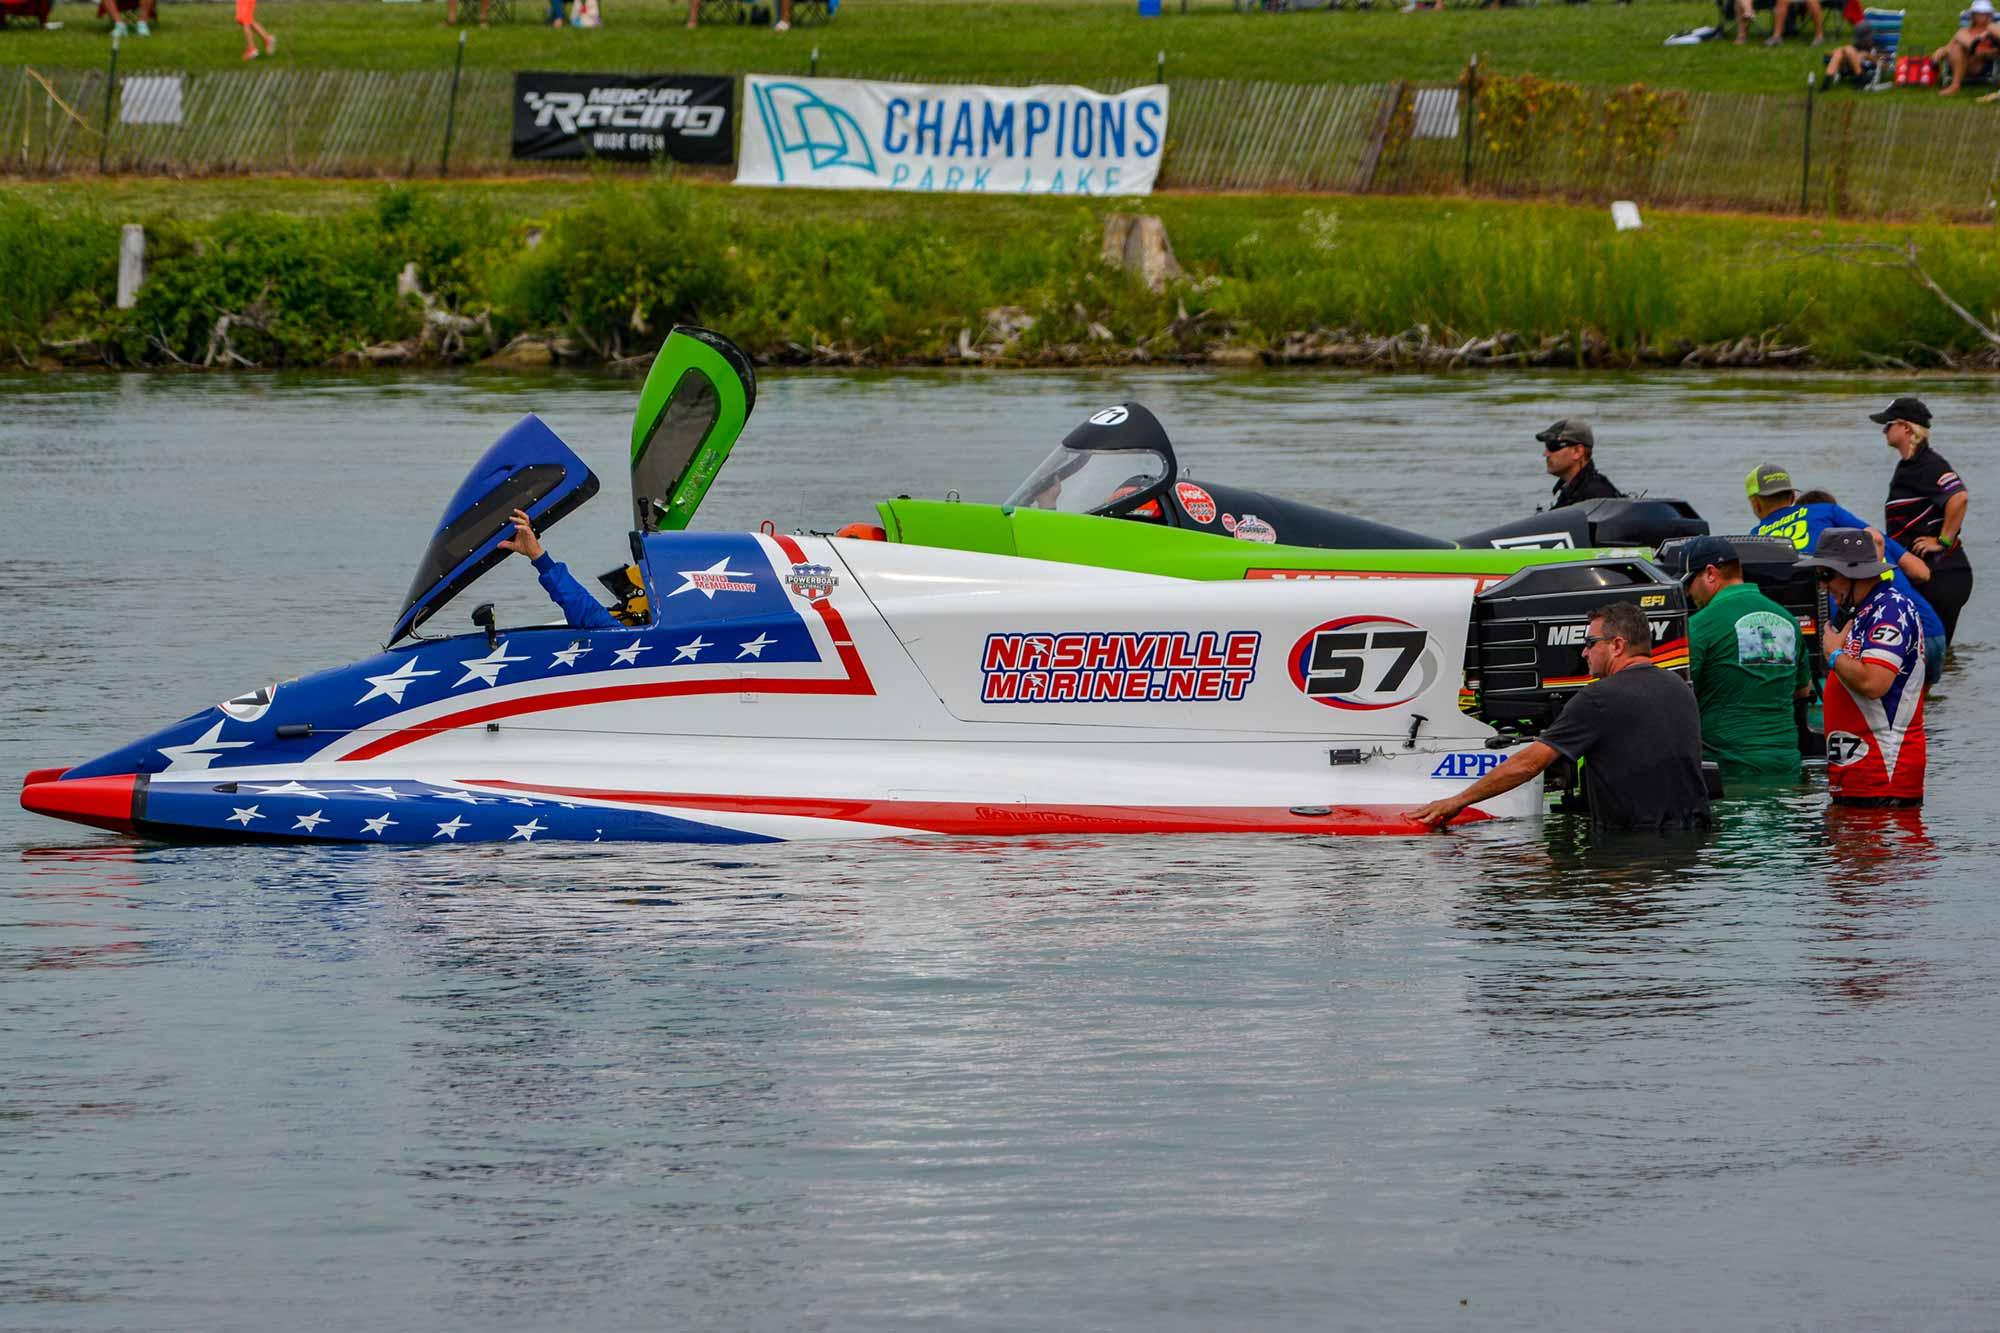 McMurray-Racing-Nashvill-Marine-2021-Springfield-F1-Race-24